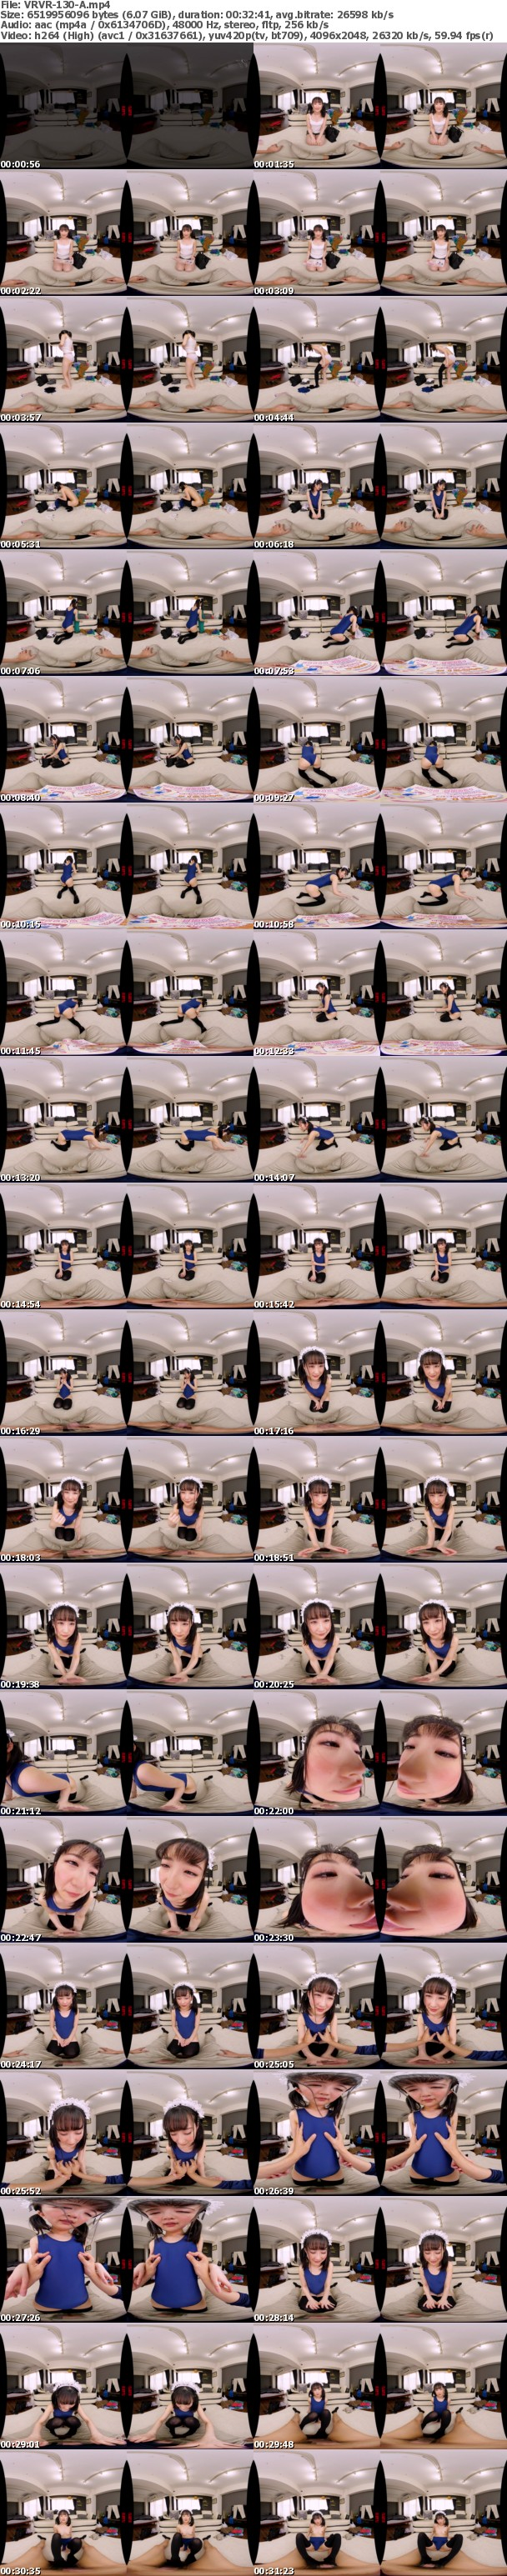 (VR) VRVR-130 「ほら、いっぱいシコシコして…」心優しいスク水ニーハイ家政婦が超至近距離で見つめながら童貞の僕にオナニーサポート!初体験のベロキス/耳舐め/ささやき/ニーハイ足コキ!一度の射精では収まらない童貞チ○ポを筆おろし!… 神野ひな